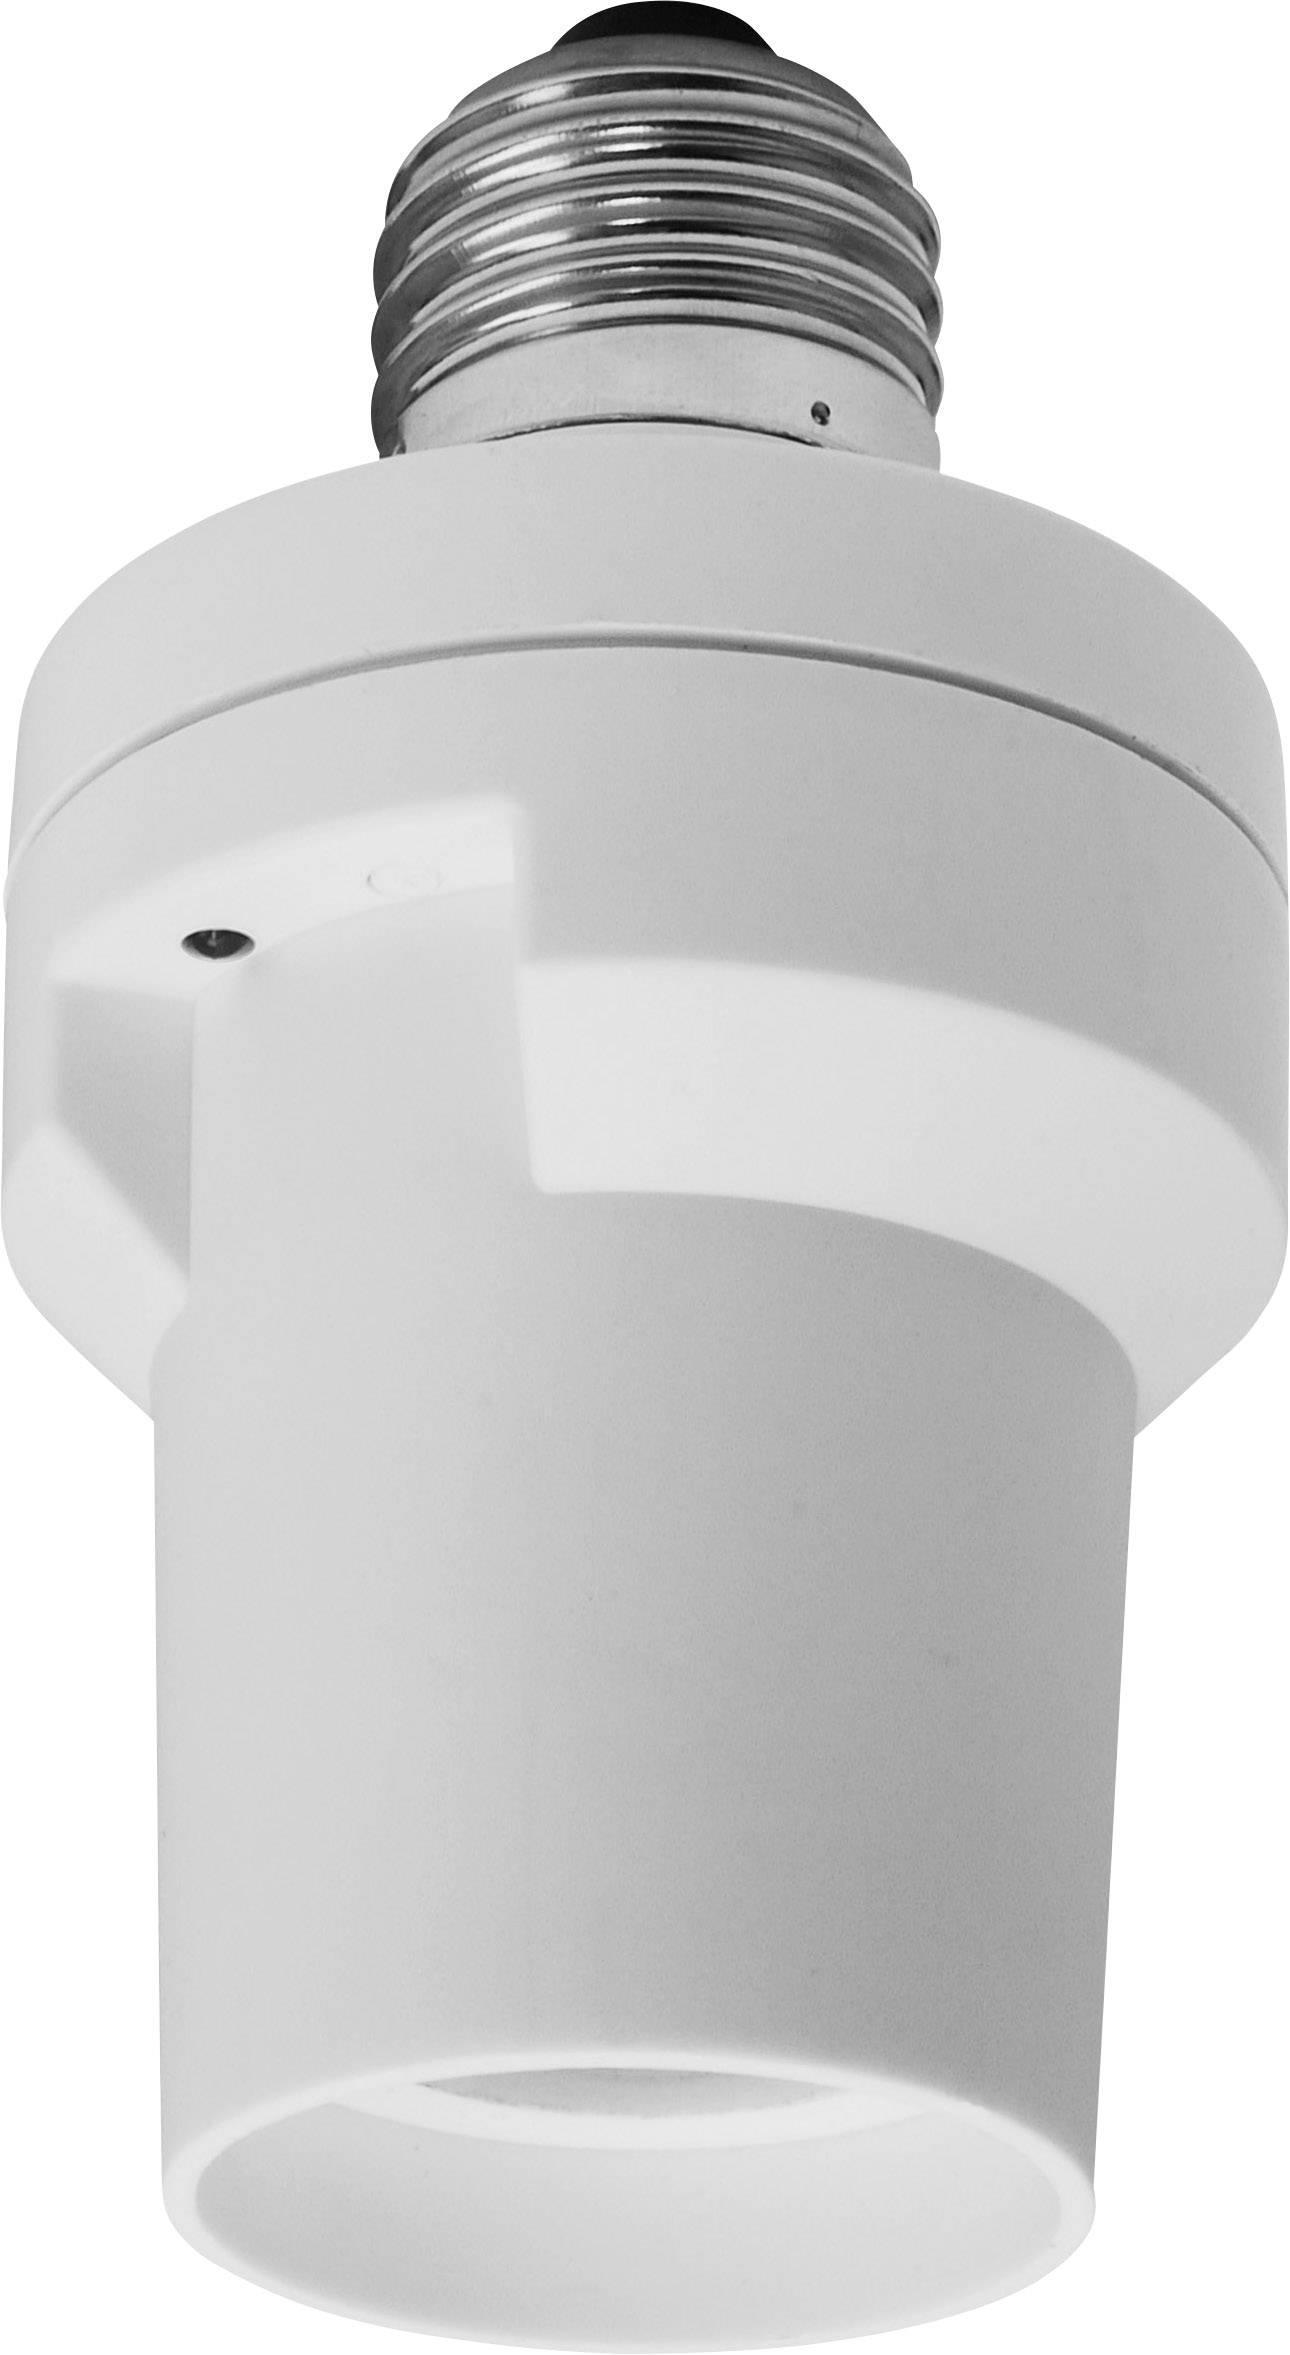 Bezdrôtový spínač lampy Smartwares SH5-RFD-A, Max. dosah 50 m